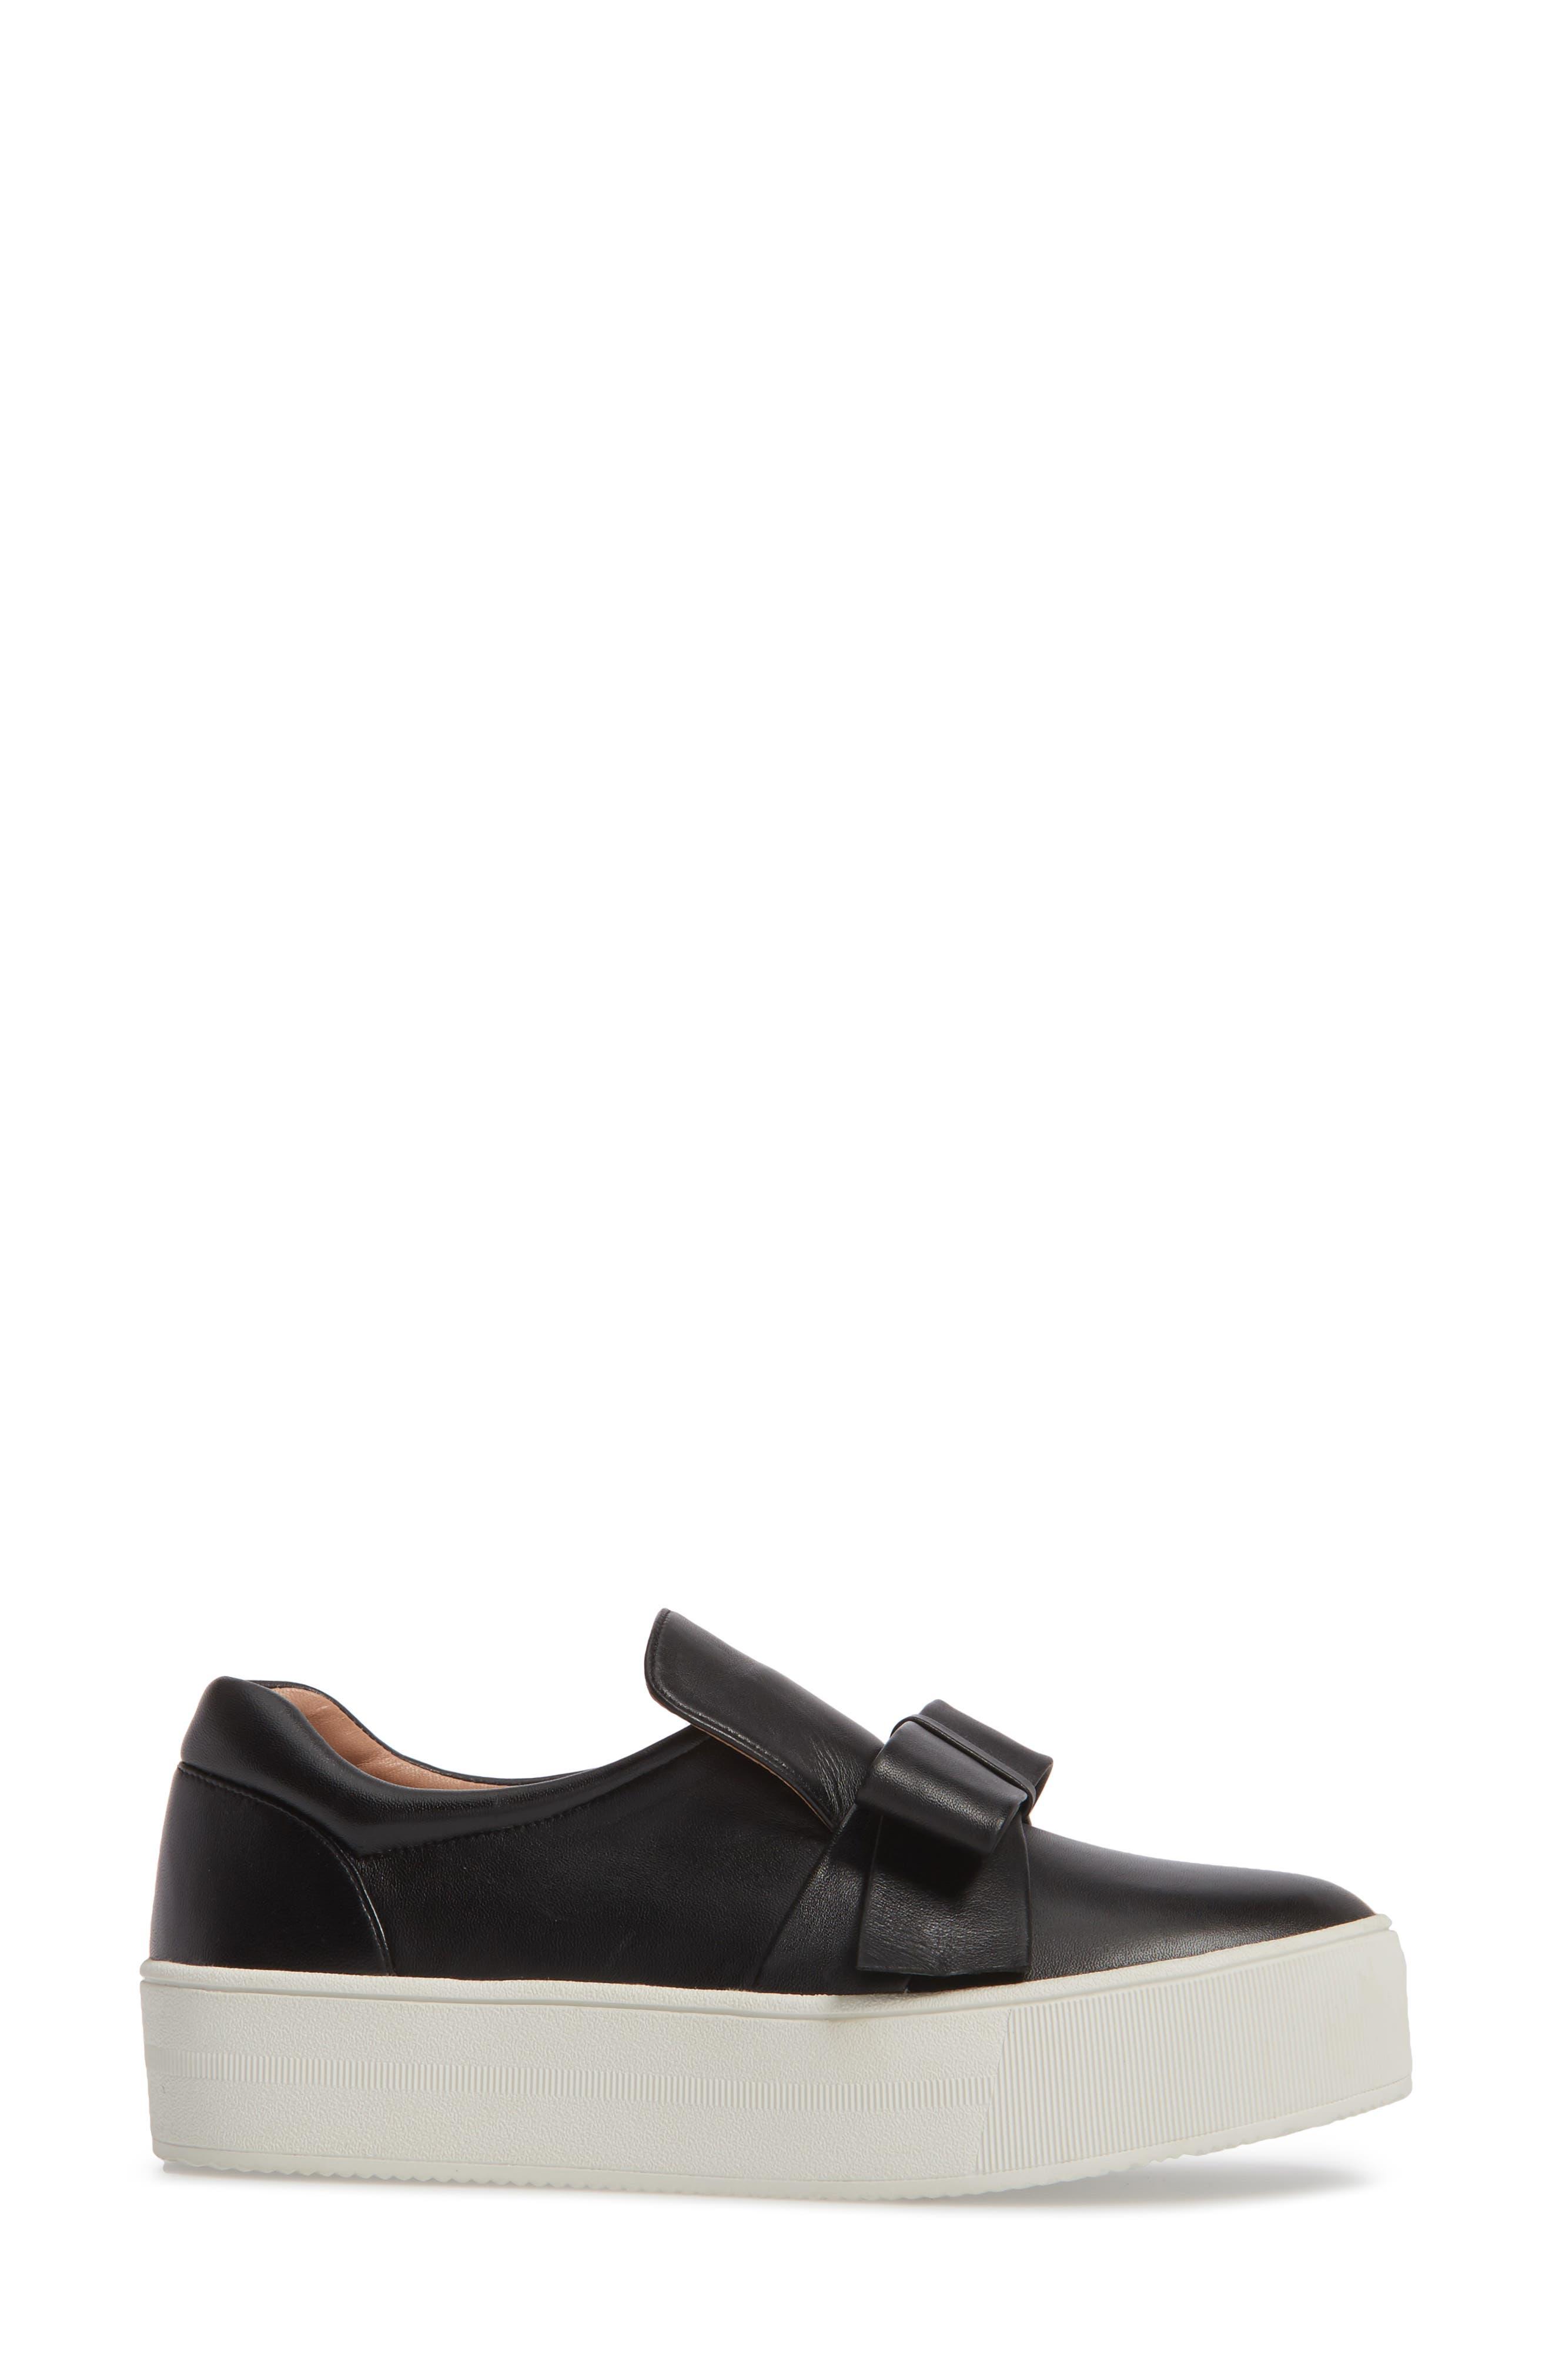 Vania Bow Platform Sneaker,                             Alternate thumbnail 3, color,                             001